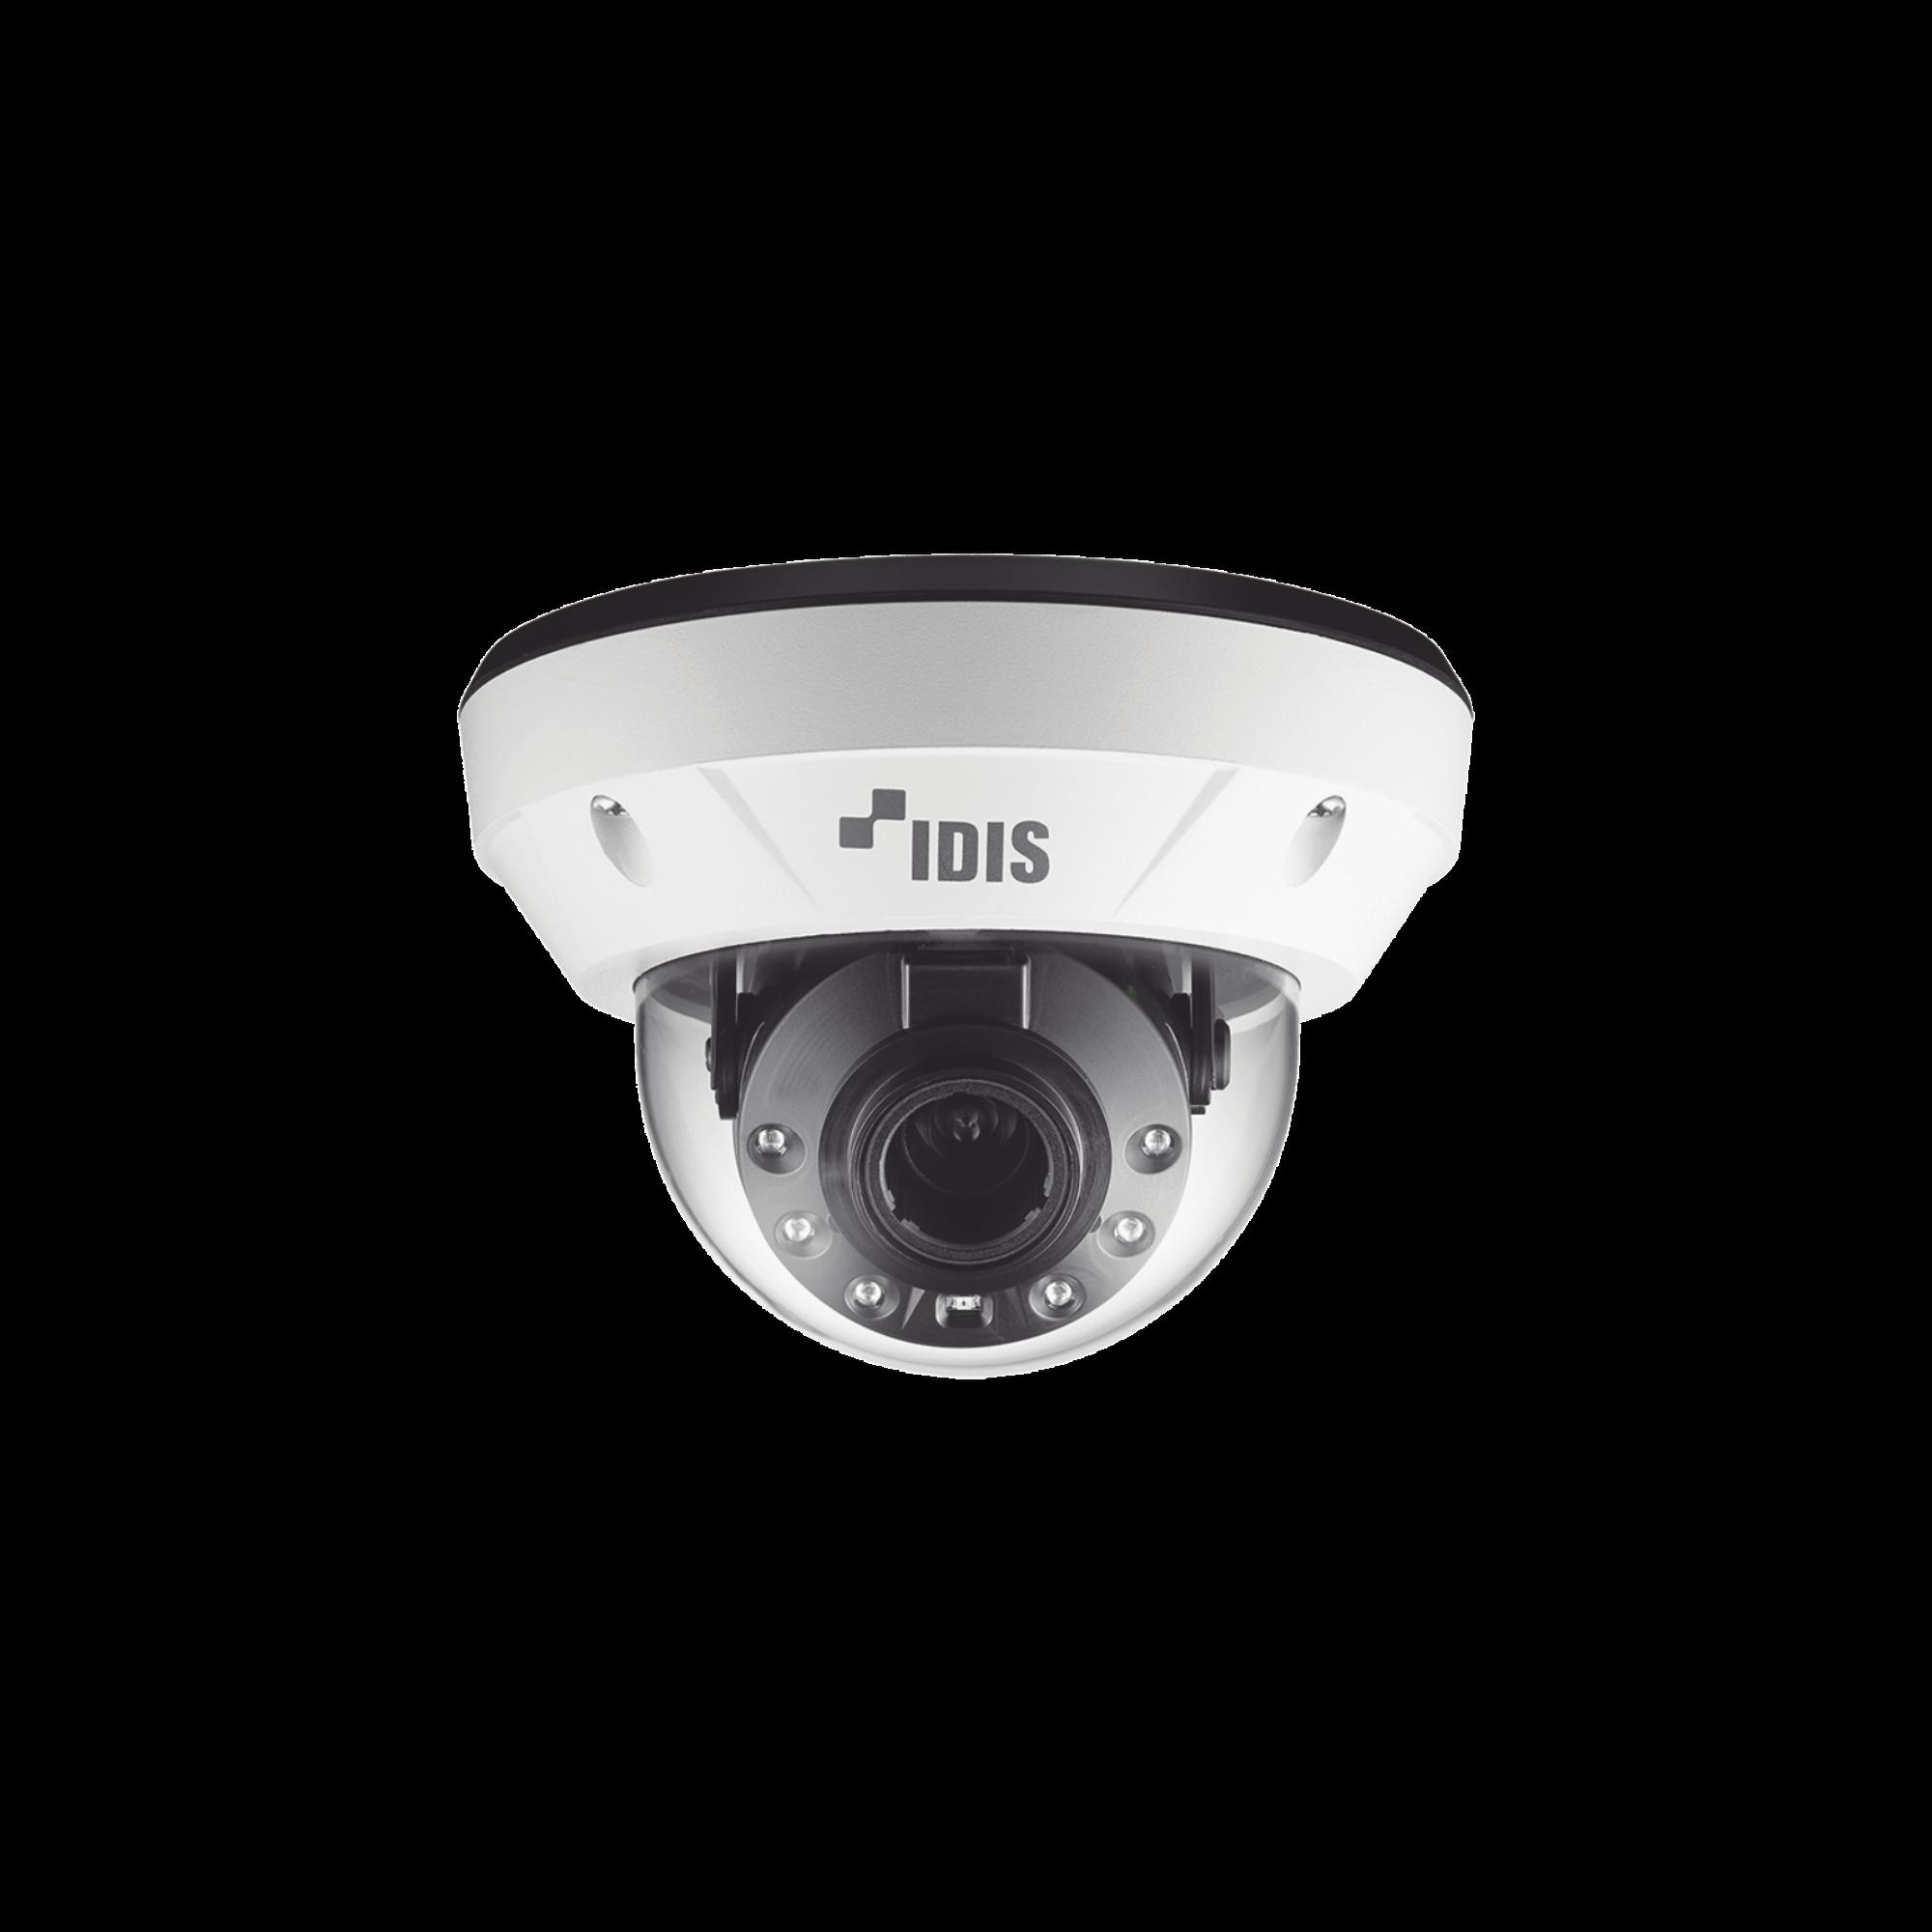 Camara IP Domo 2 Megapixel (1080p) | Antivandalica IK10 | Audio de dos vias | Alarma I/O | PoE | IR 30m | ONVIF | Dia/Noche | MicroSD | INTELLIGENT CODEC